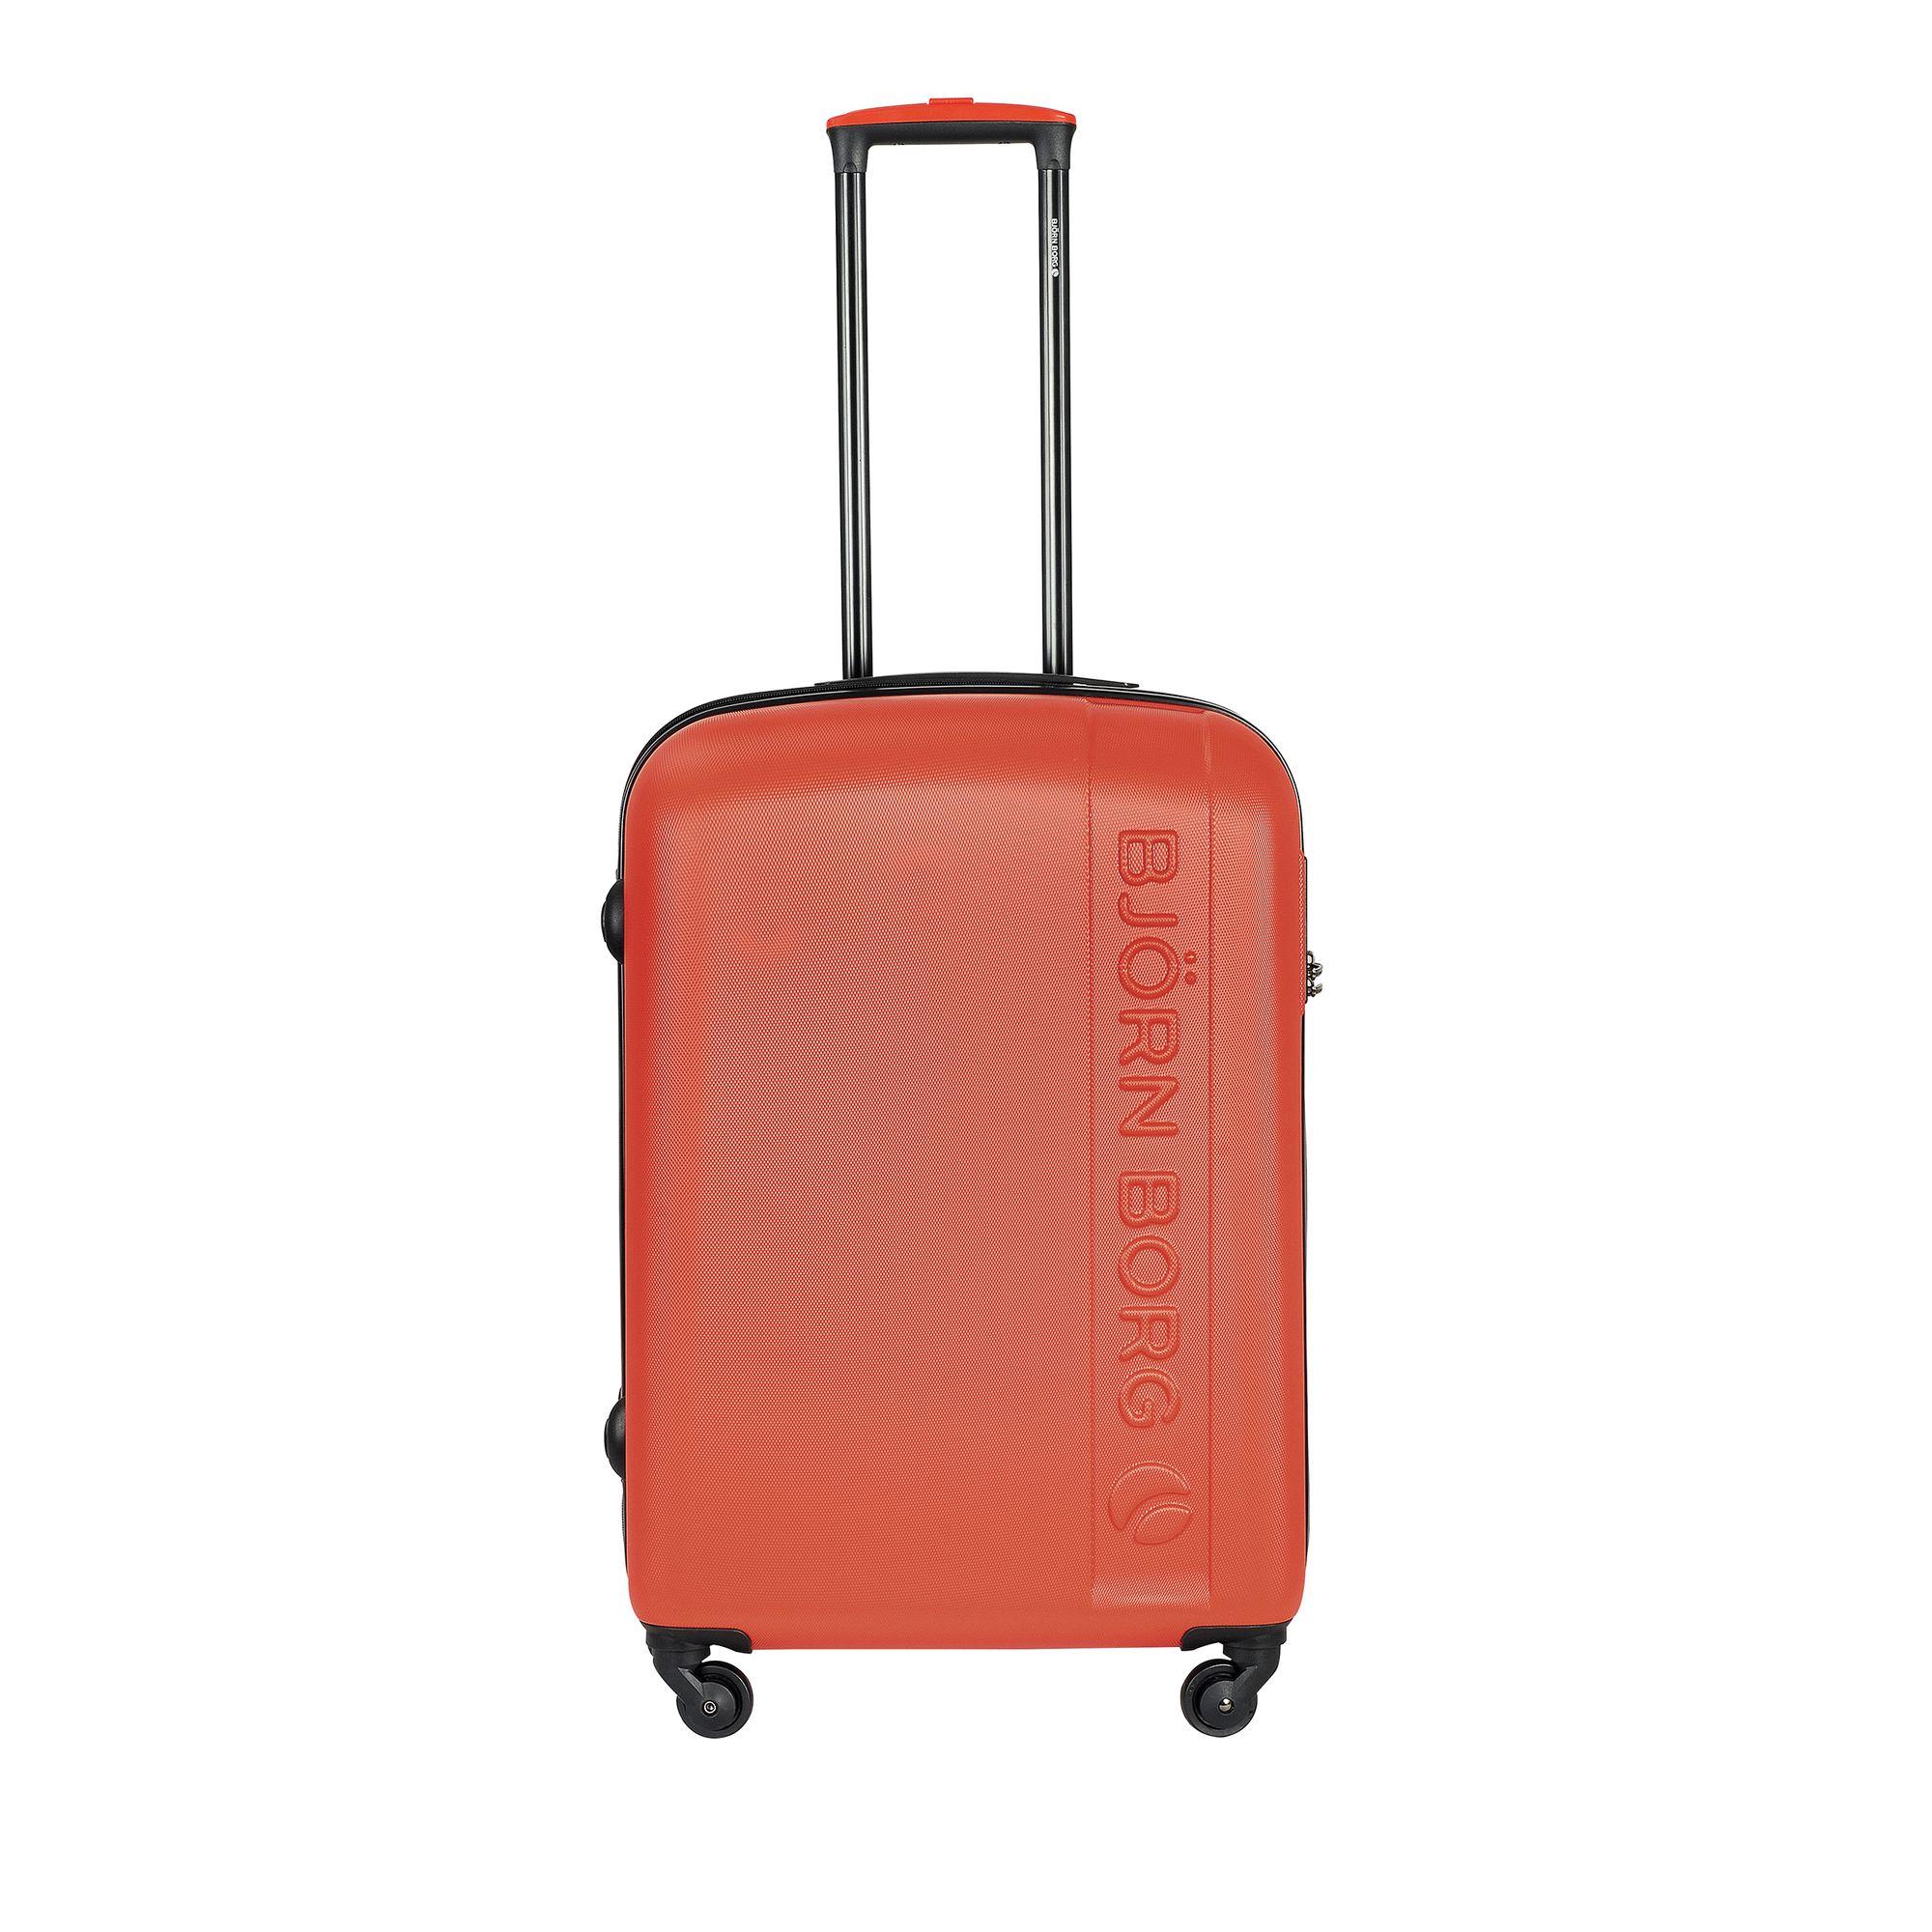 Björn Borg Hot Solid resväska, 4 hjul, 55/65/78 cm, Orange, 67cm